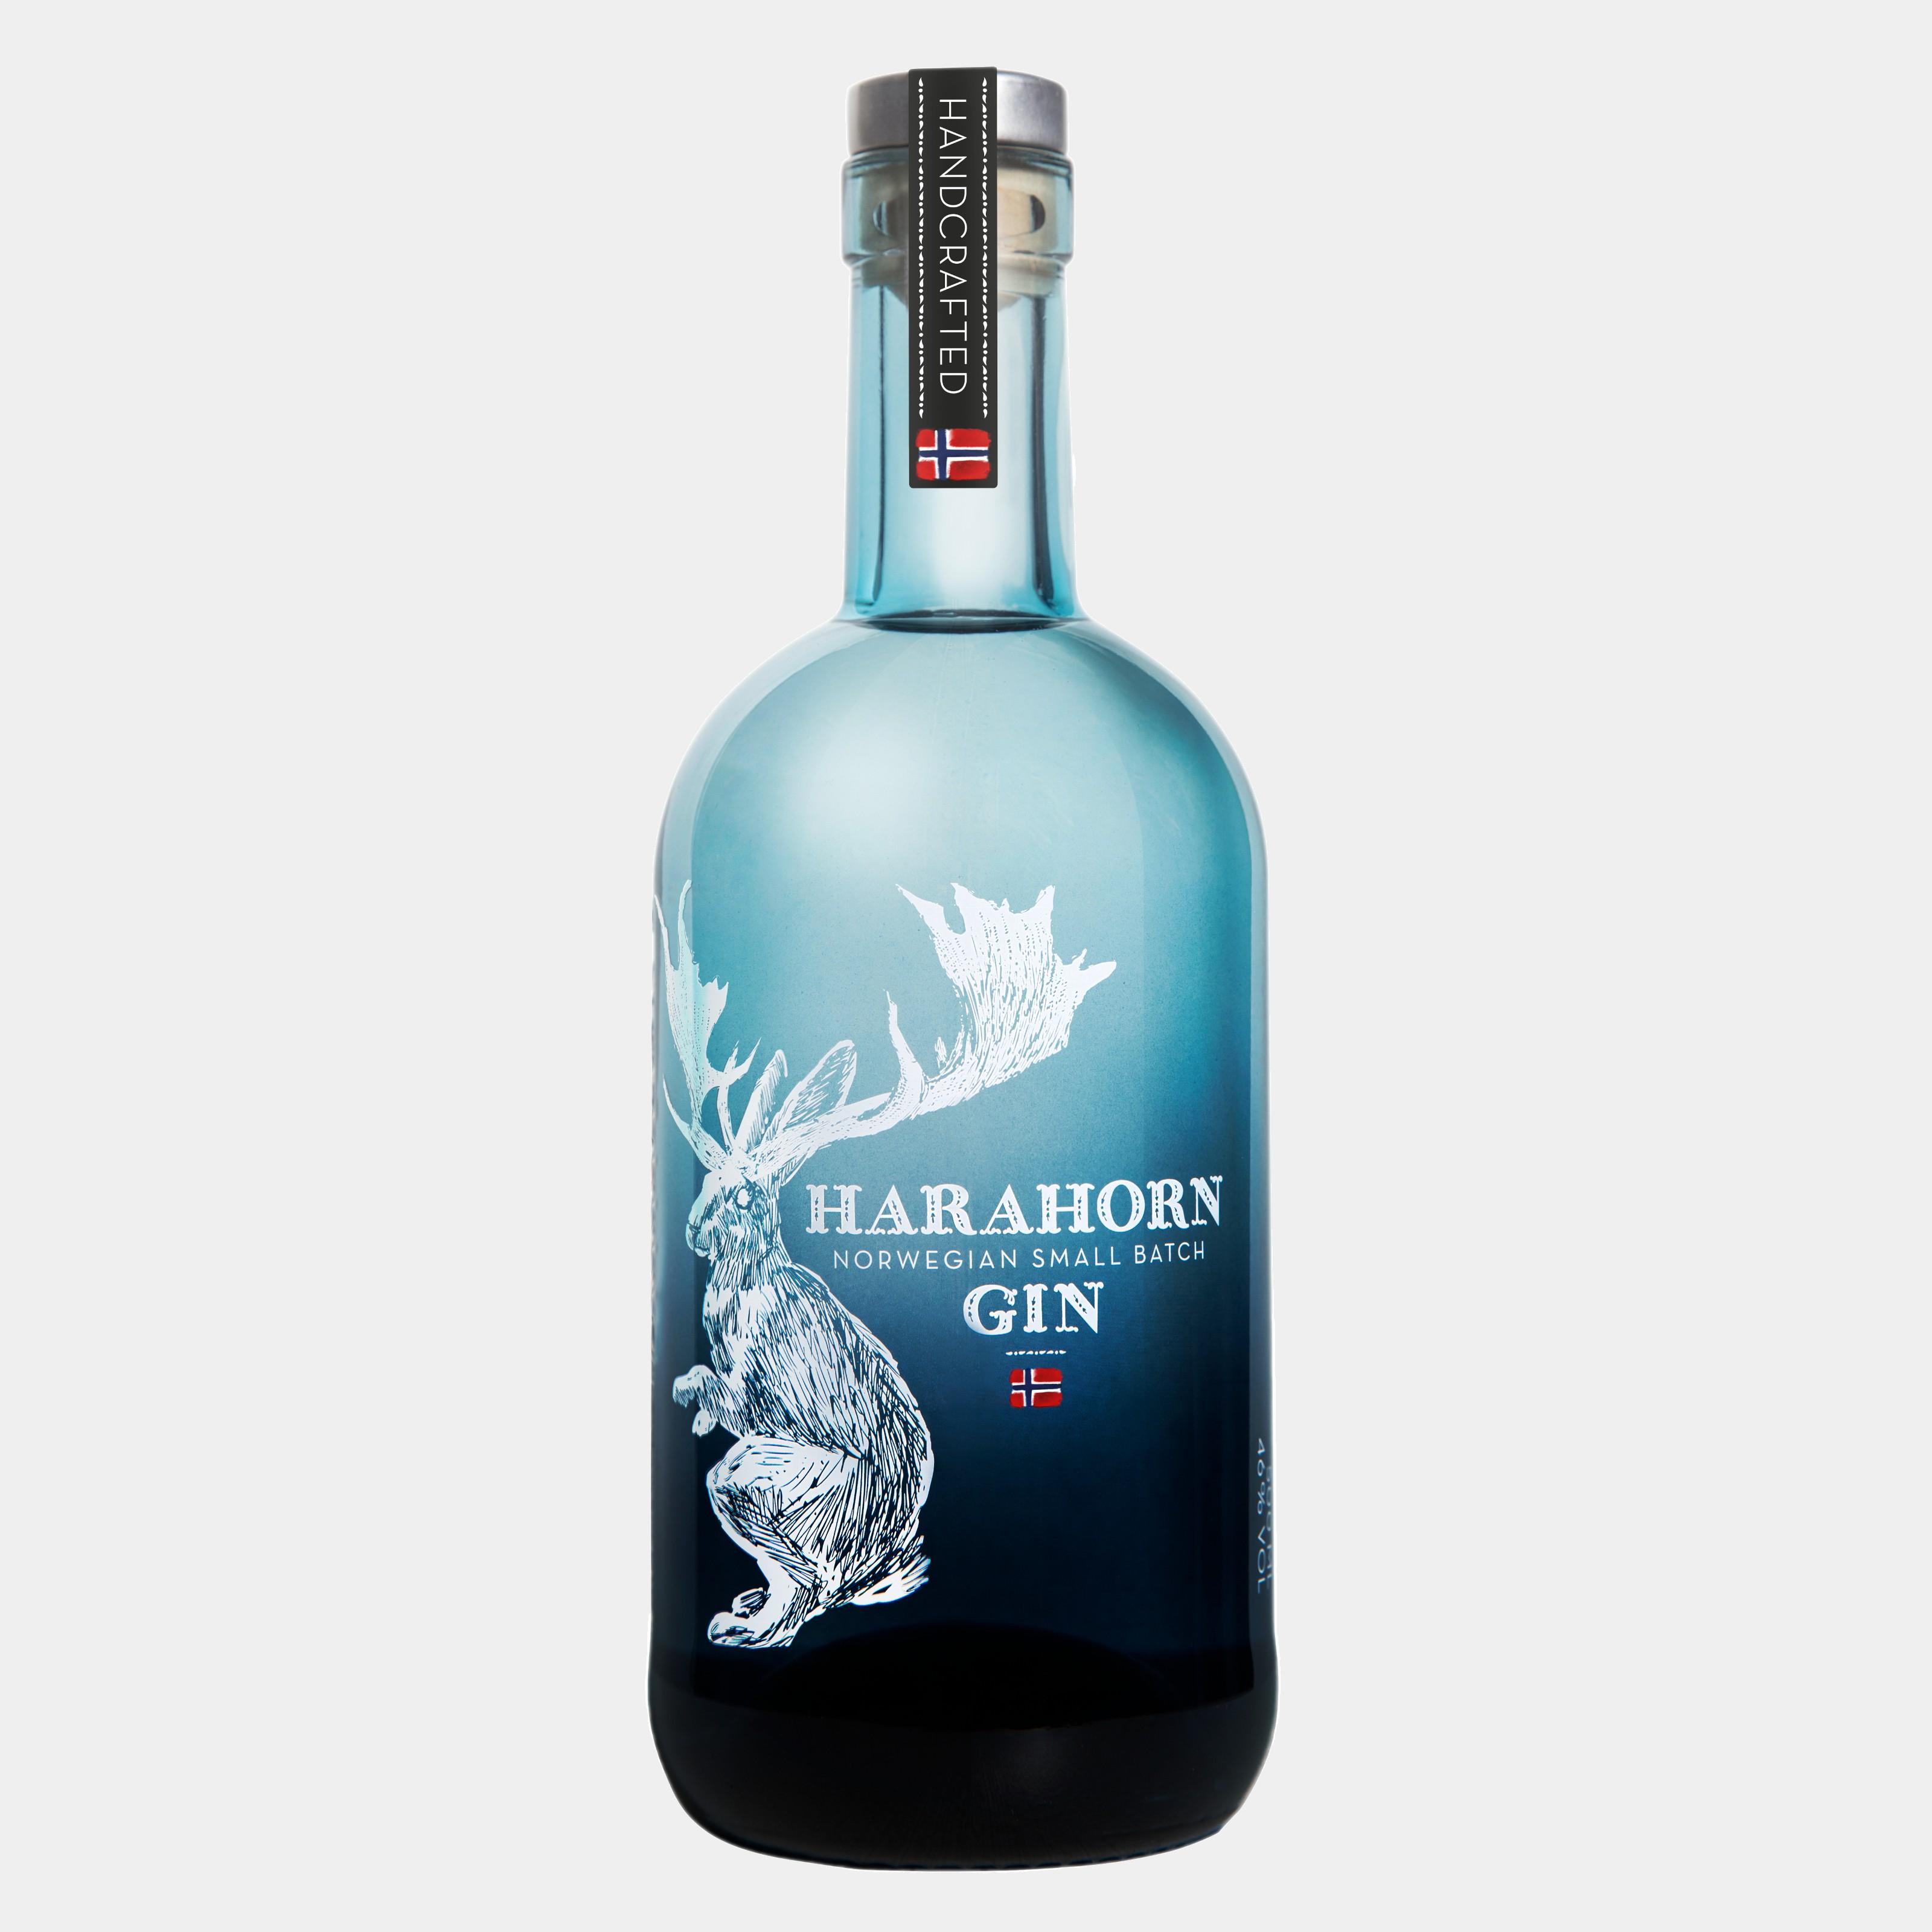 Harahorn Gin 0.5l 46% Alk.